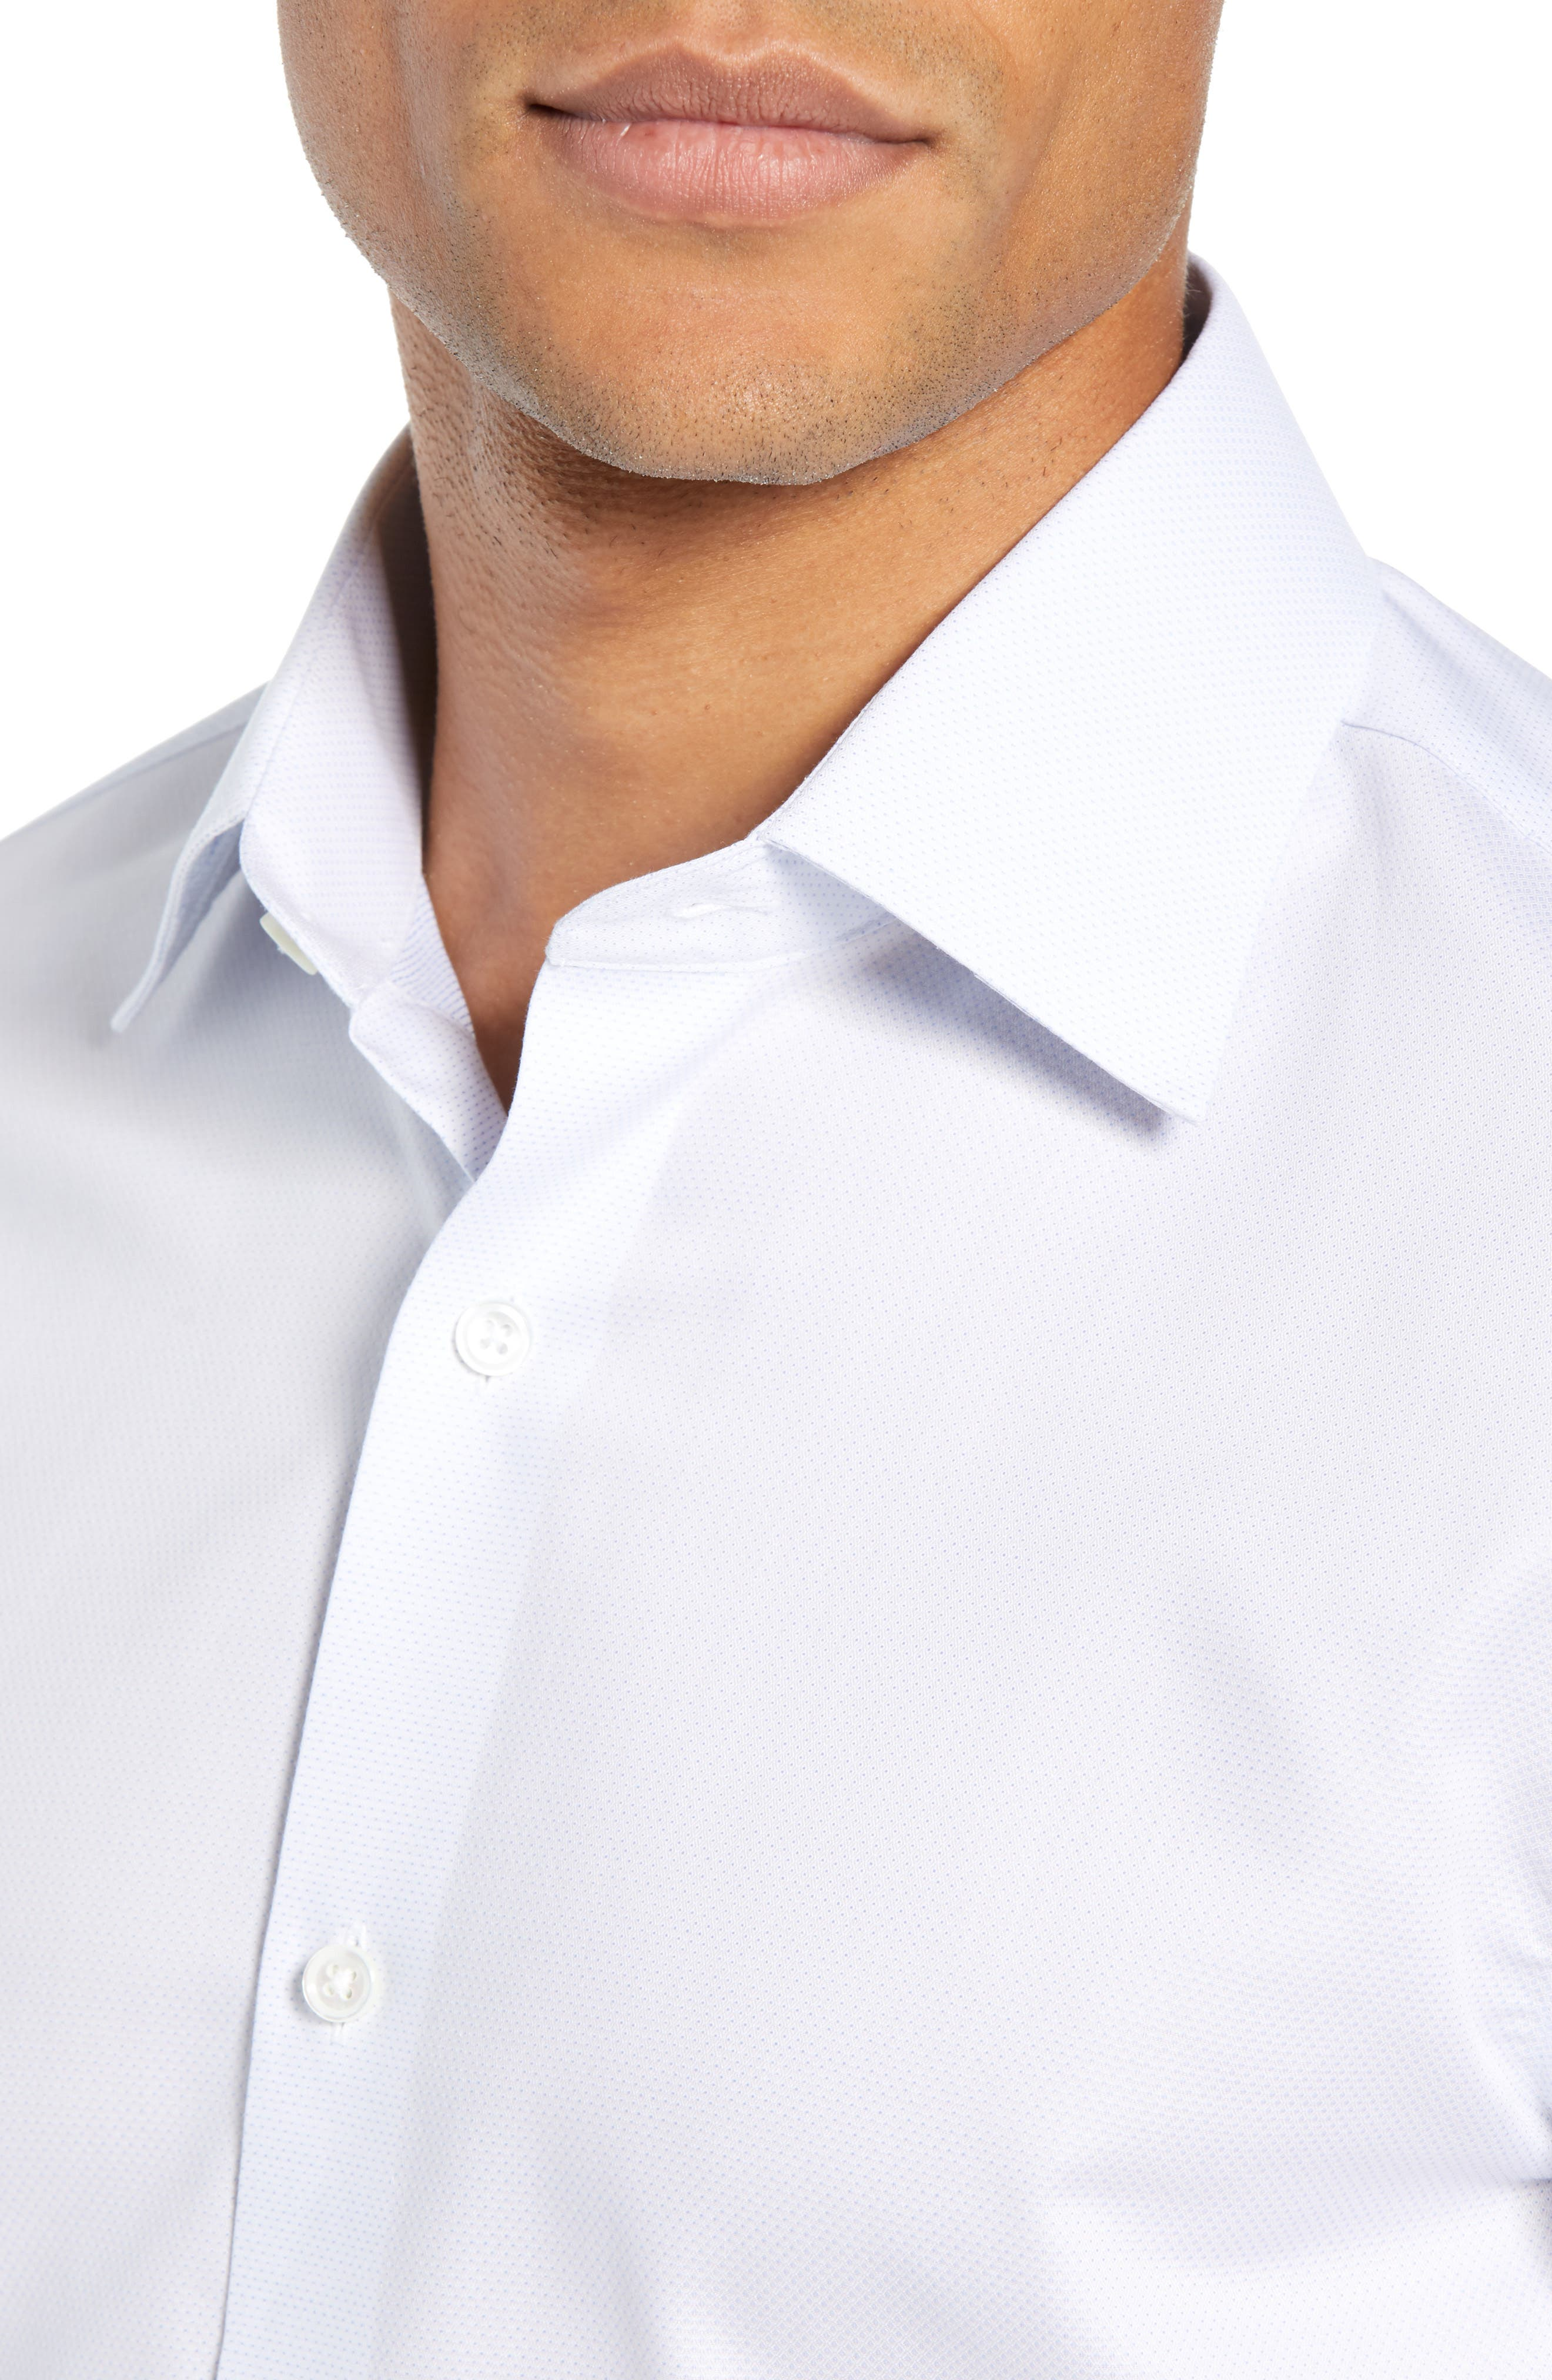 Swiss Performance Slim Fit Solid Dress Shirt,                             Alternate thumbnail 2, color,                             SOFT BLUE